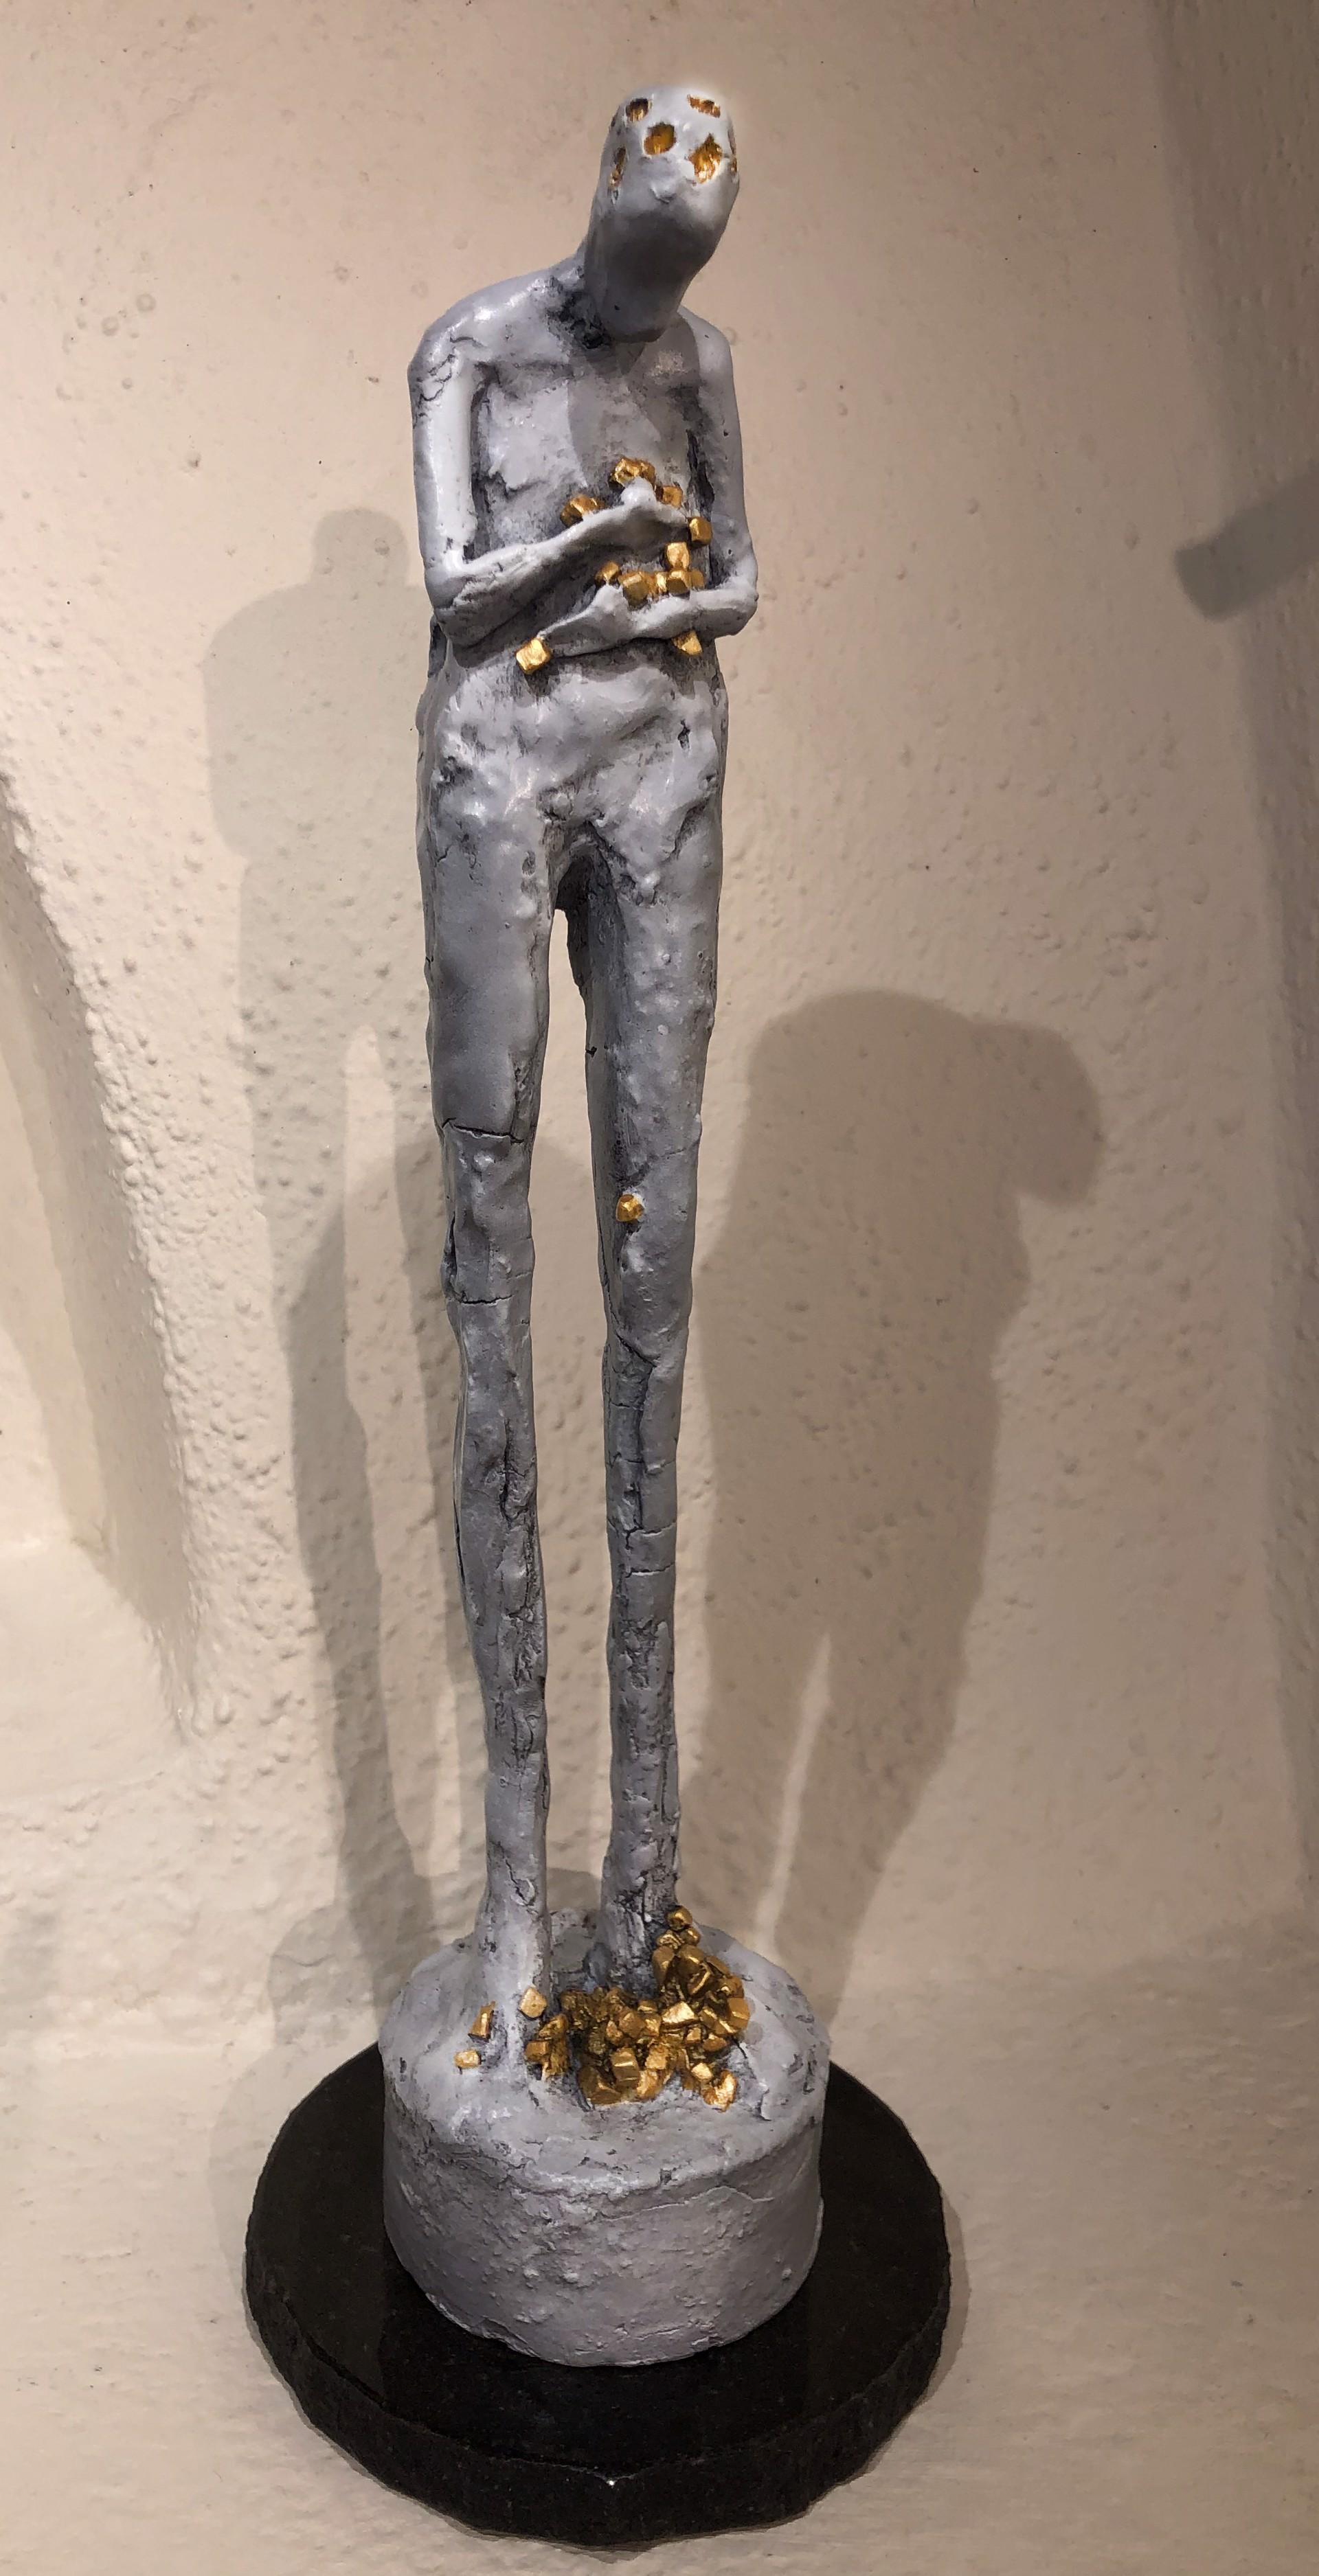 Missing Pieces by Lorri Acott